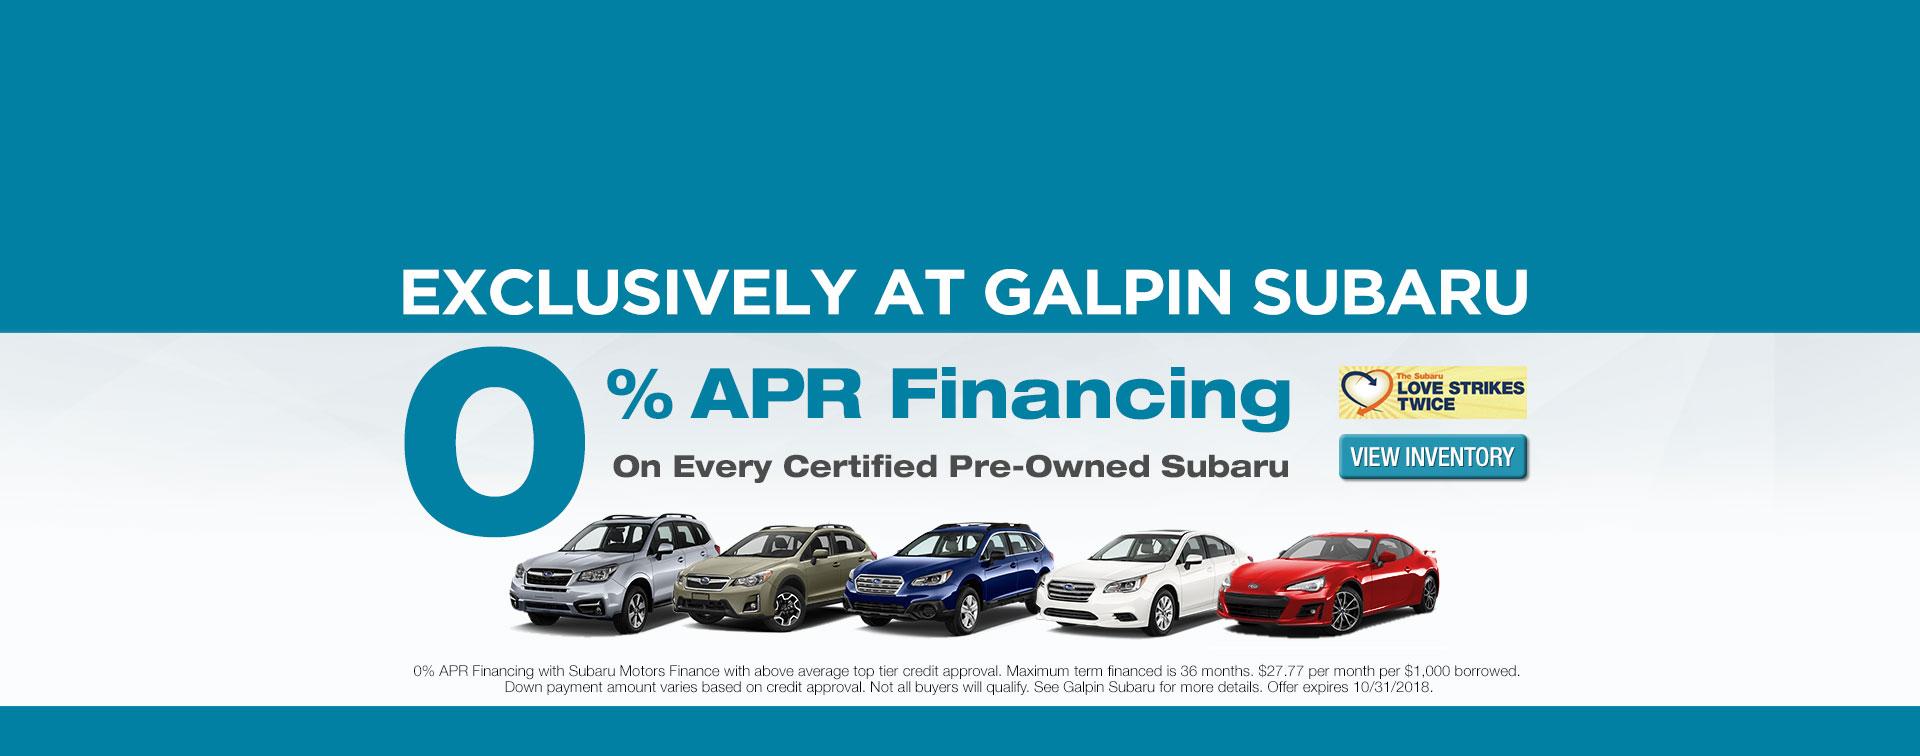 Galpin Subaru Dealership In Santa Clarita Sales Lease Service - Galpin aston martin inventory